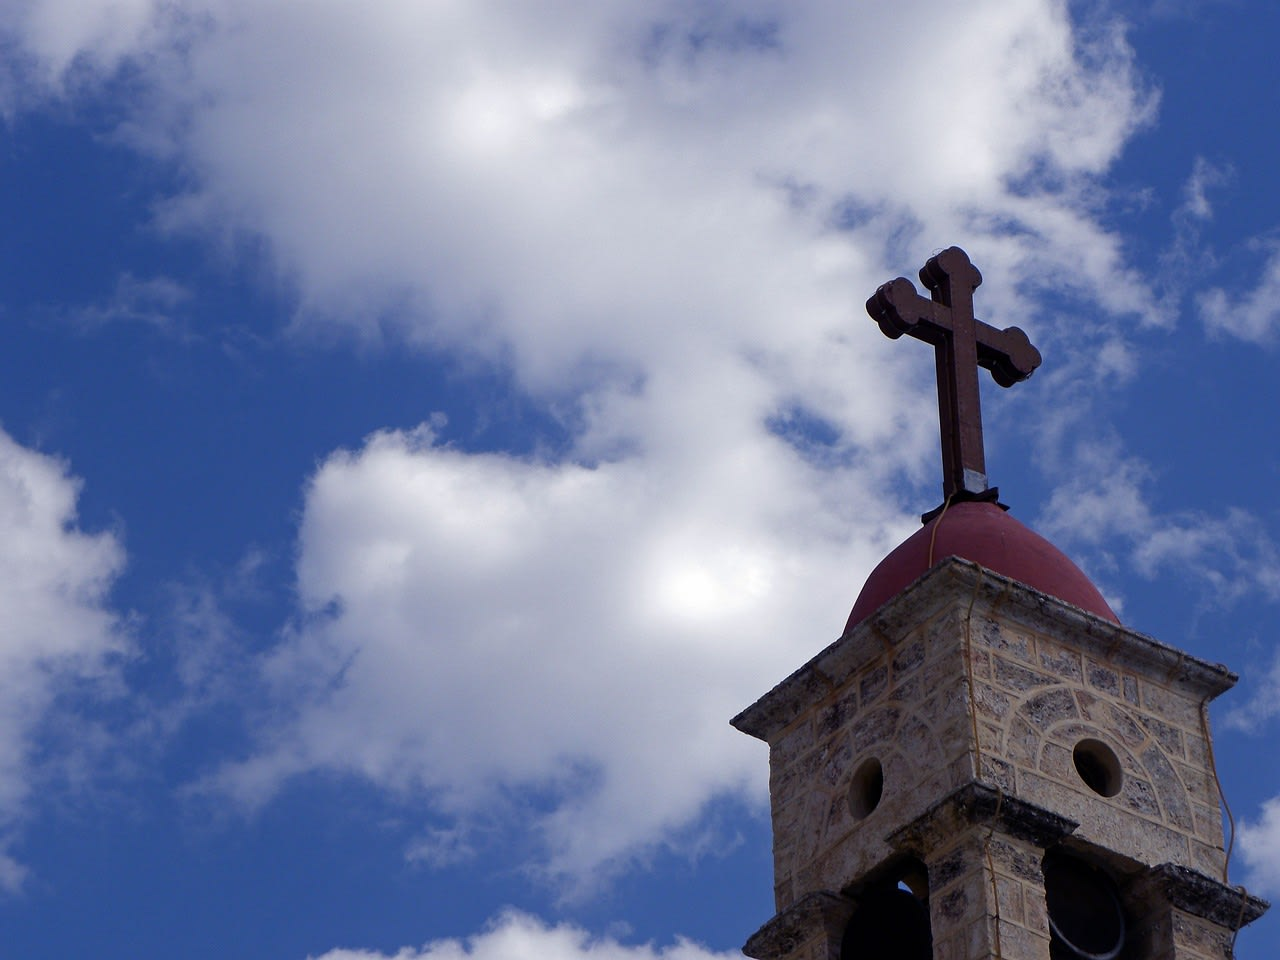 Explore the Architectural Beauty of Nazareth